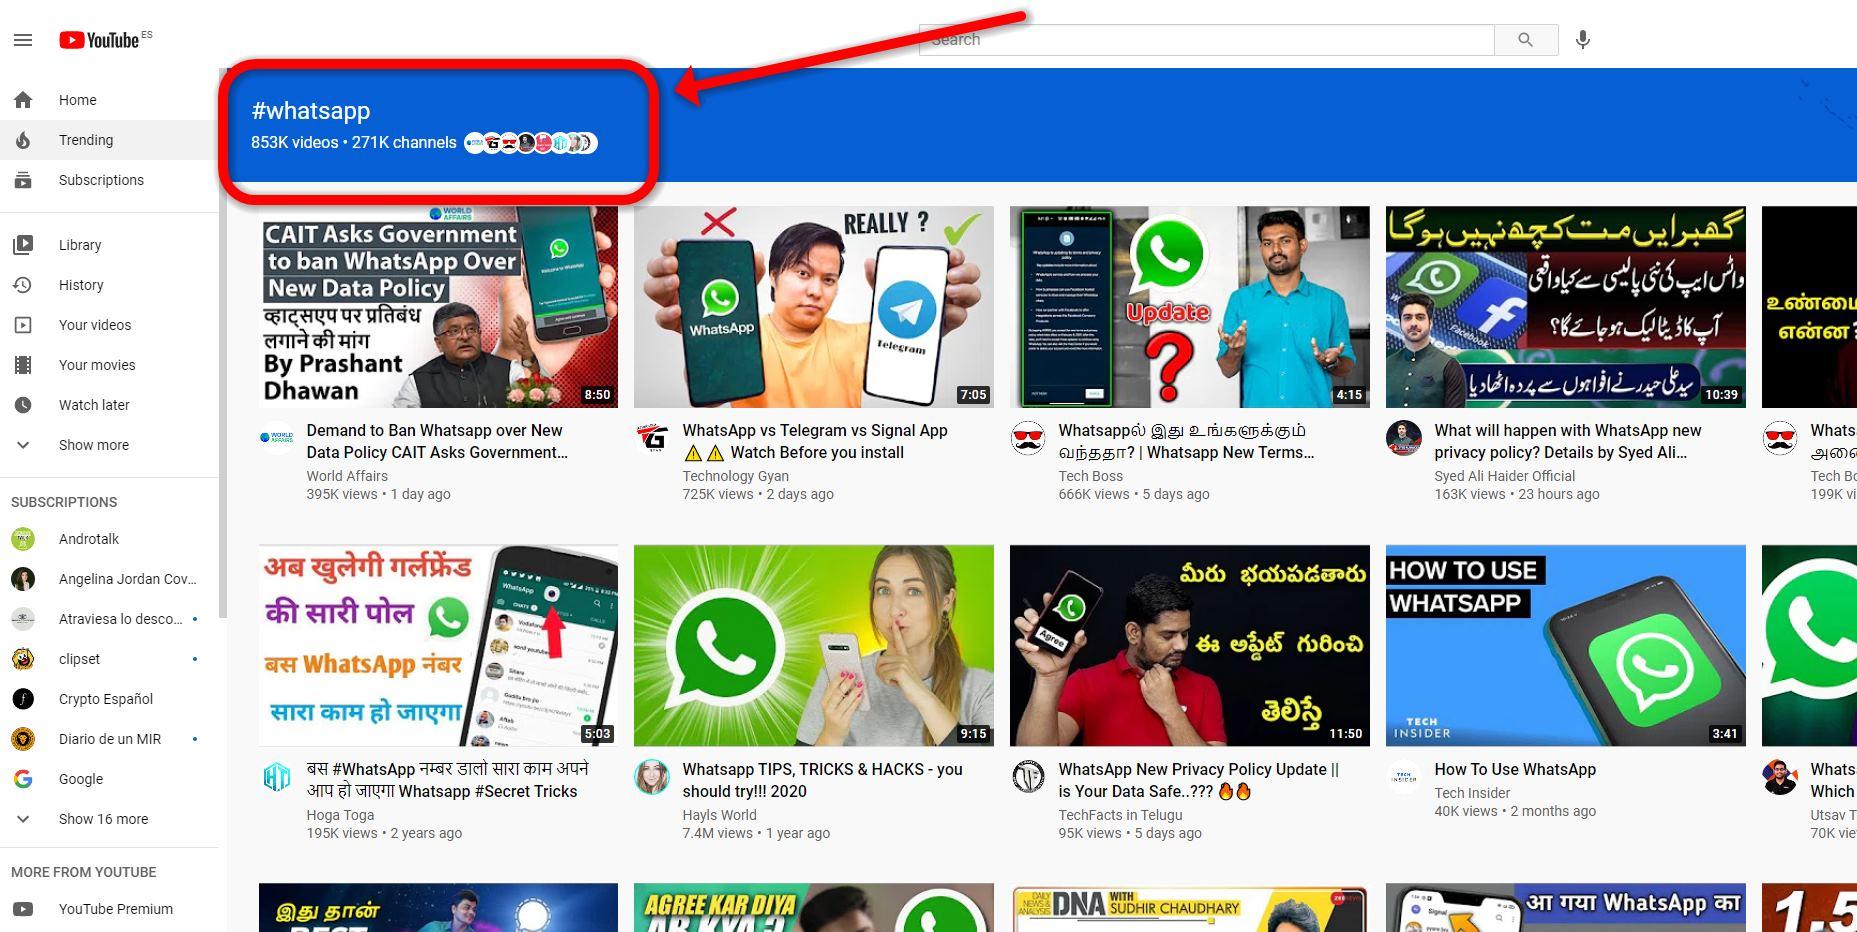 Nueva forma de navegar por Youtube usando hashtags